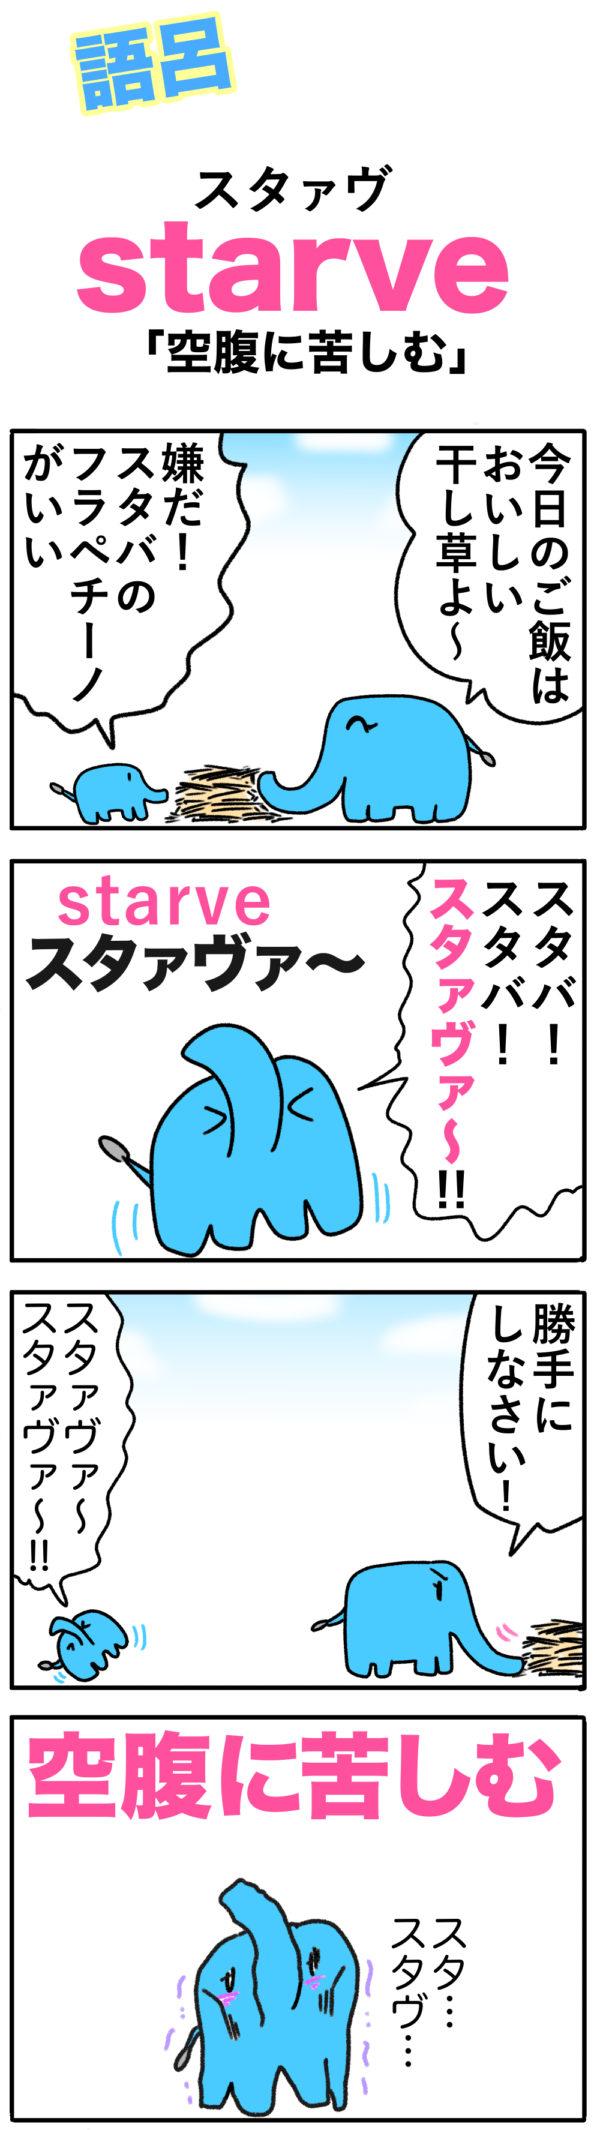 starveの覚え方